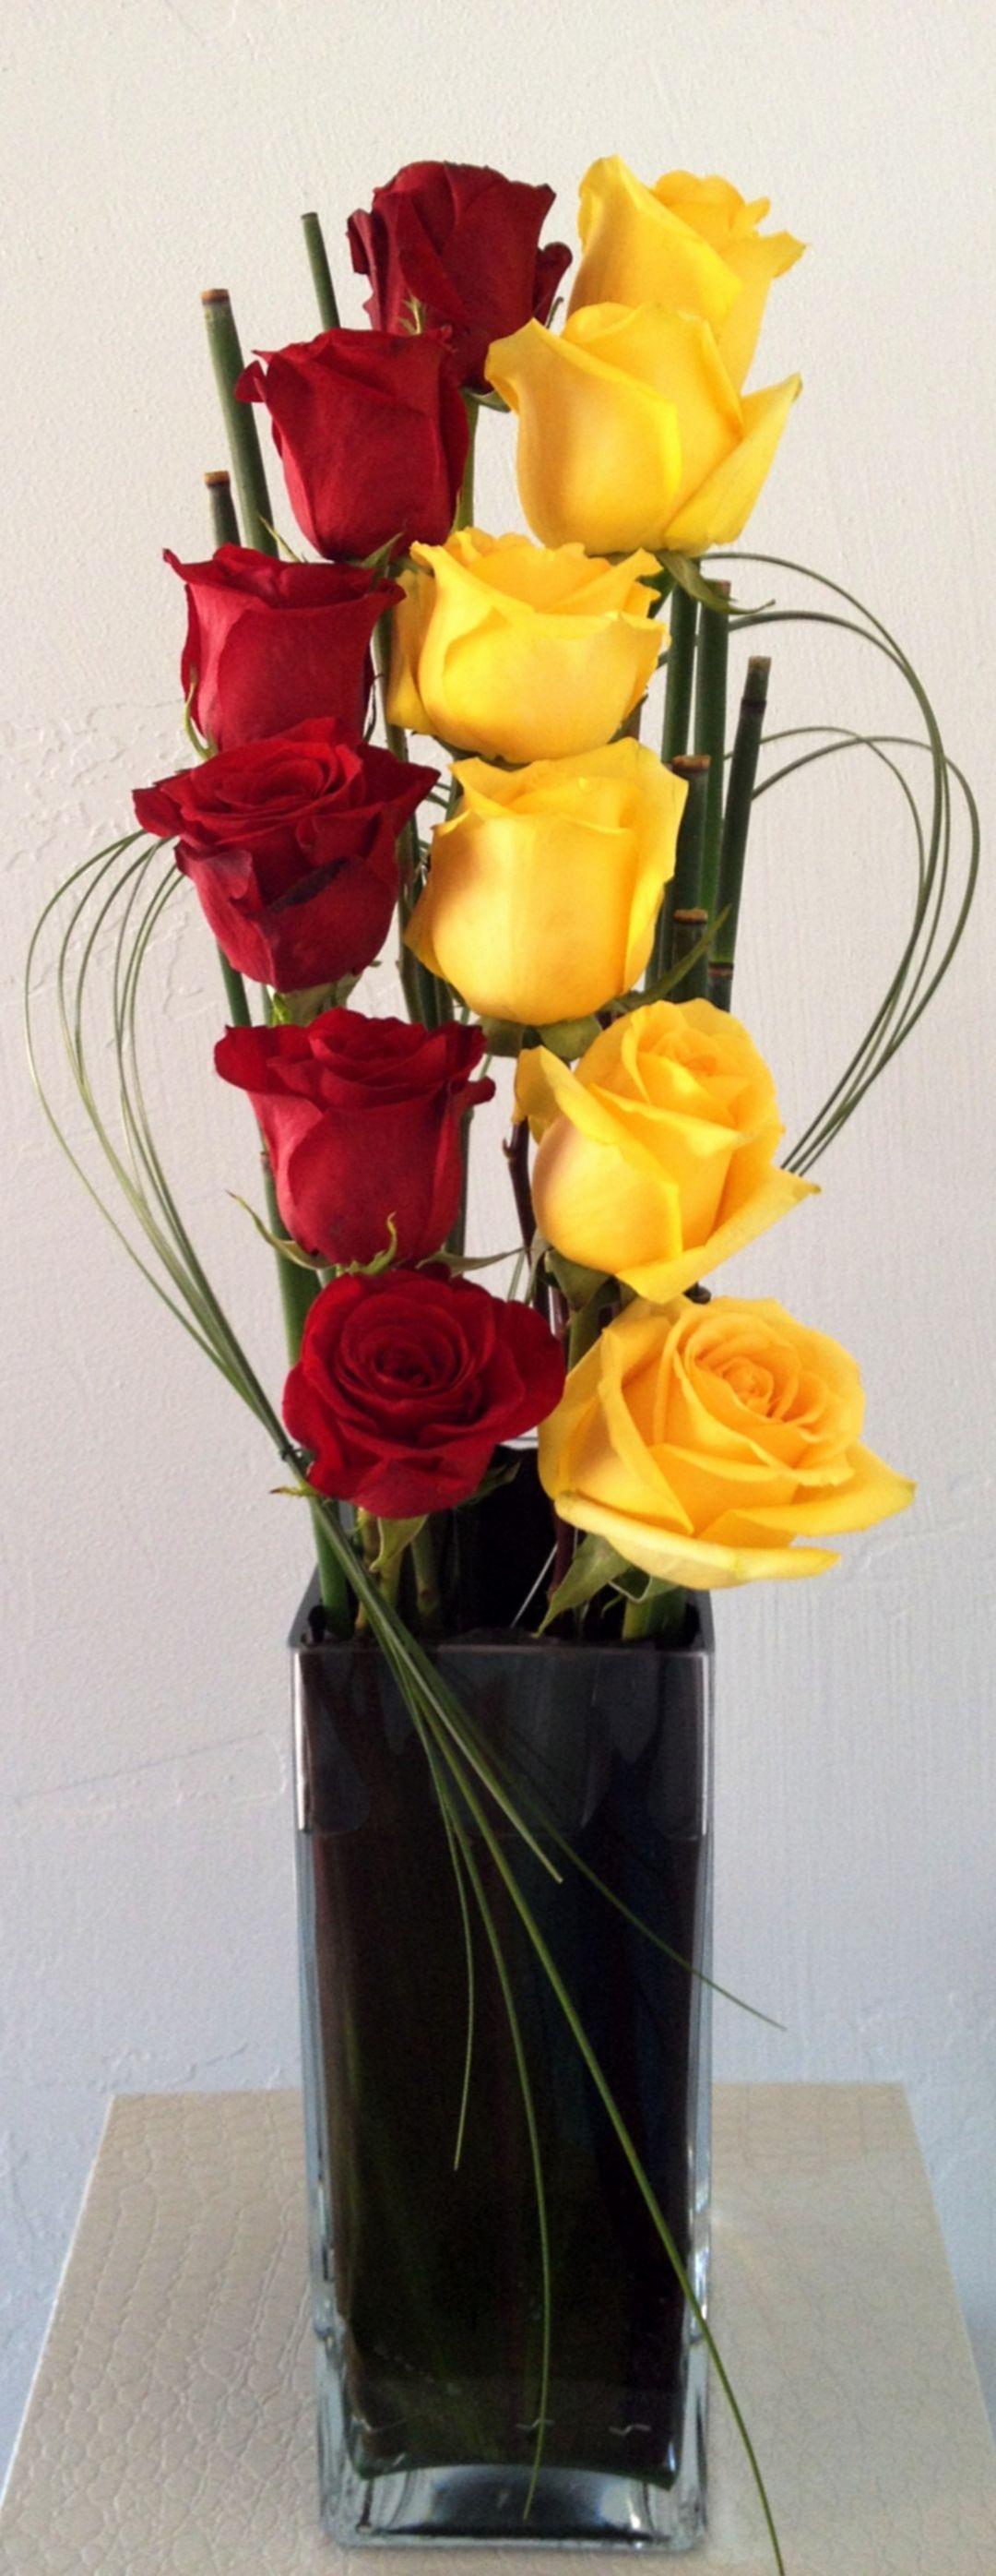 Wonderful Rose Arrangement Ideas For Your Girlfriend 6008 Image